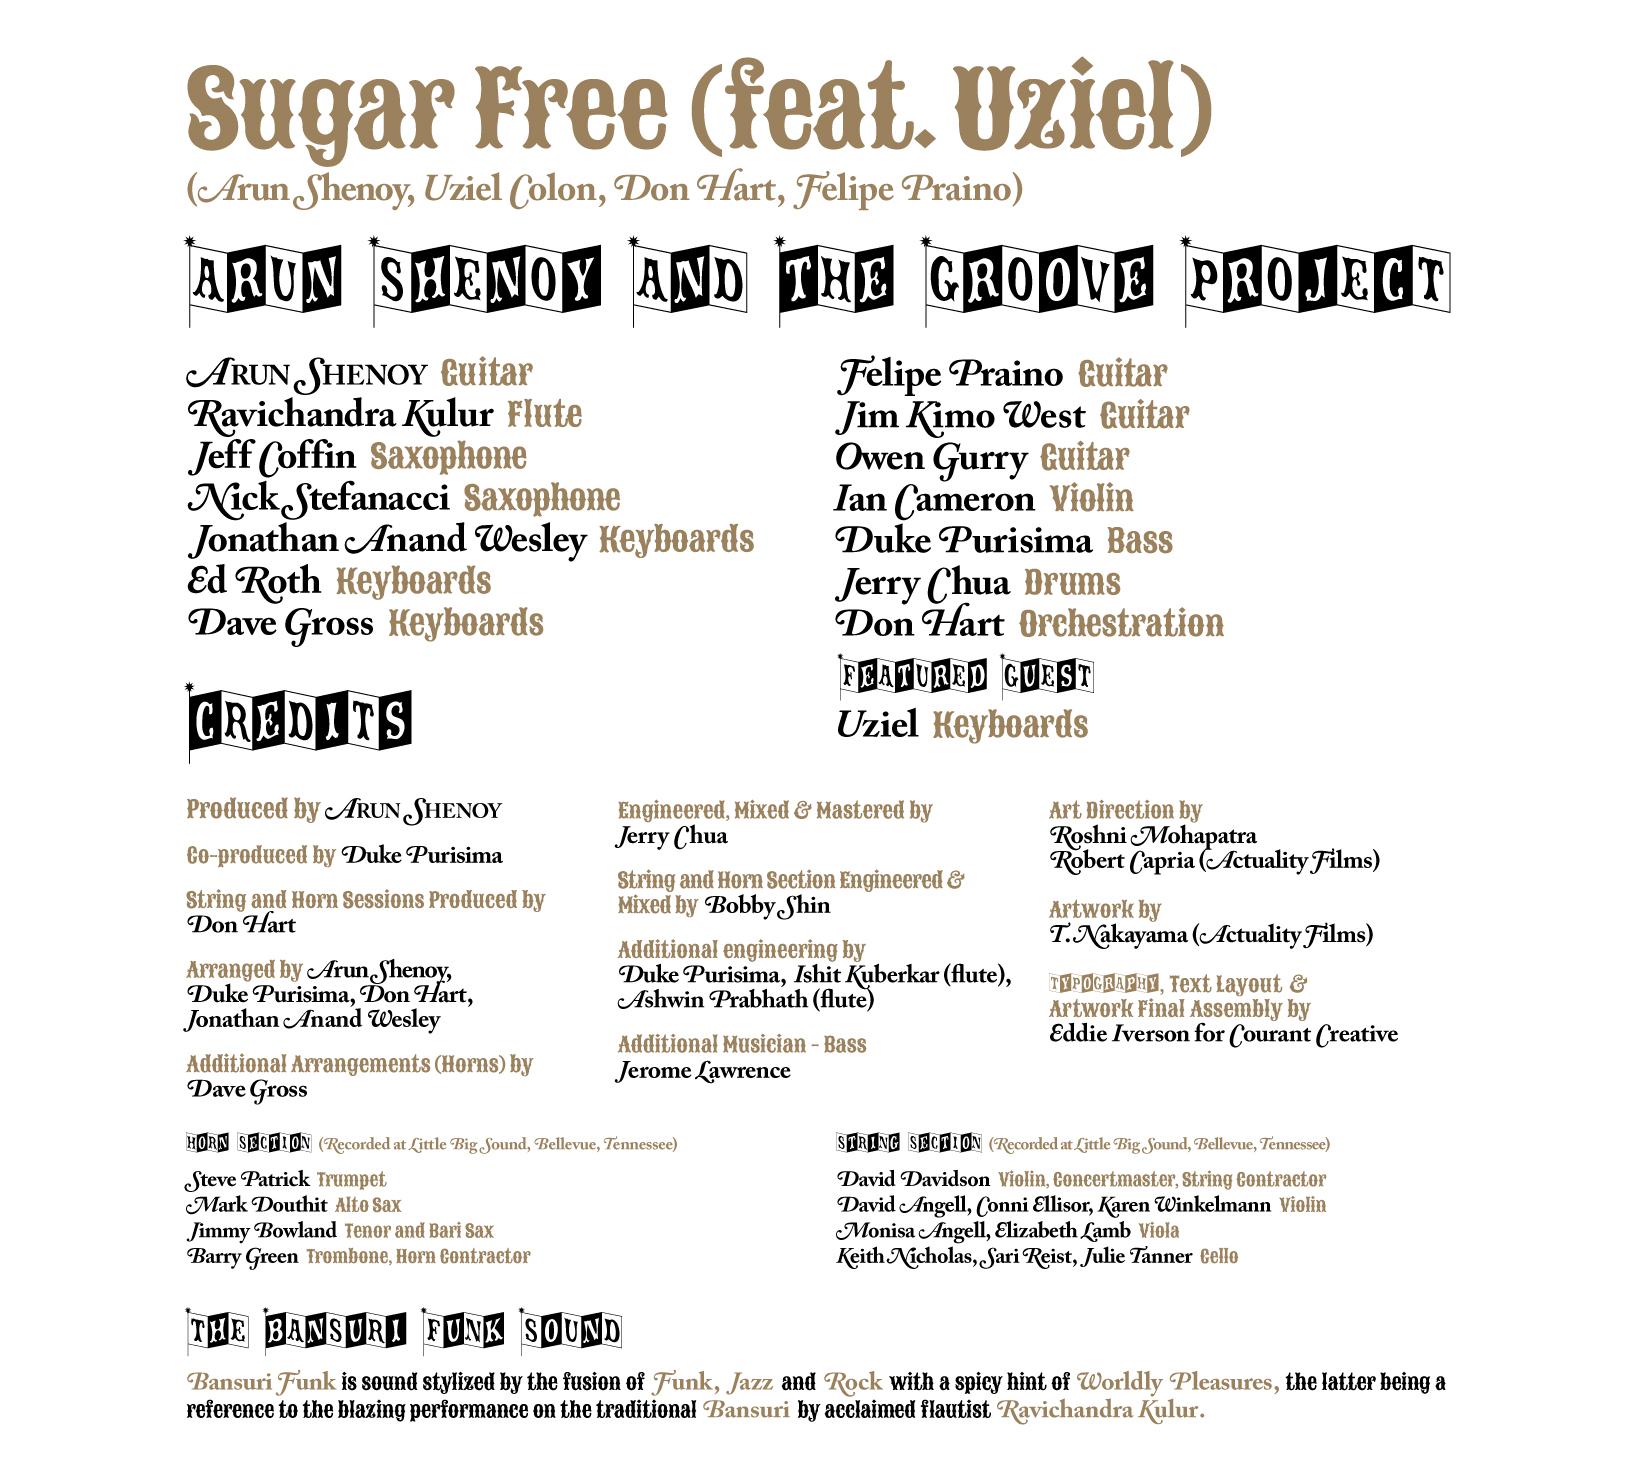 Sugar Free (feat. Uziel) Credits